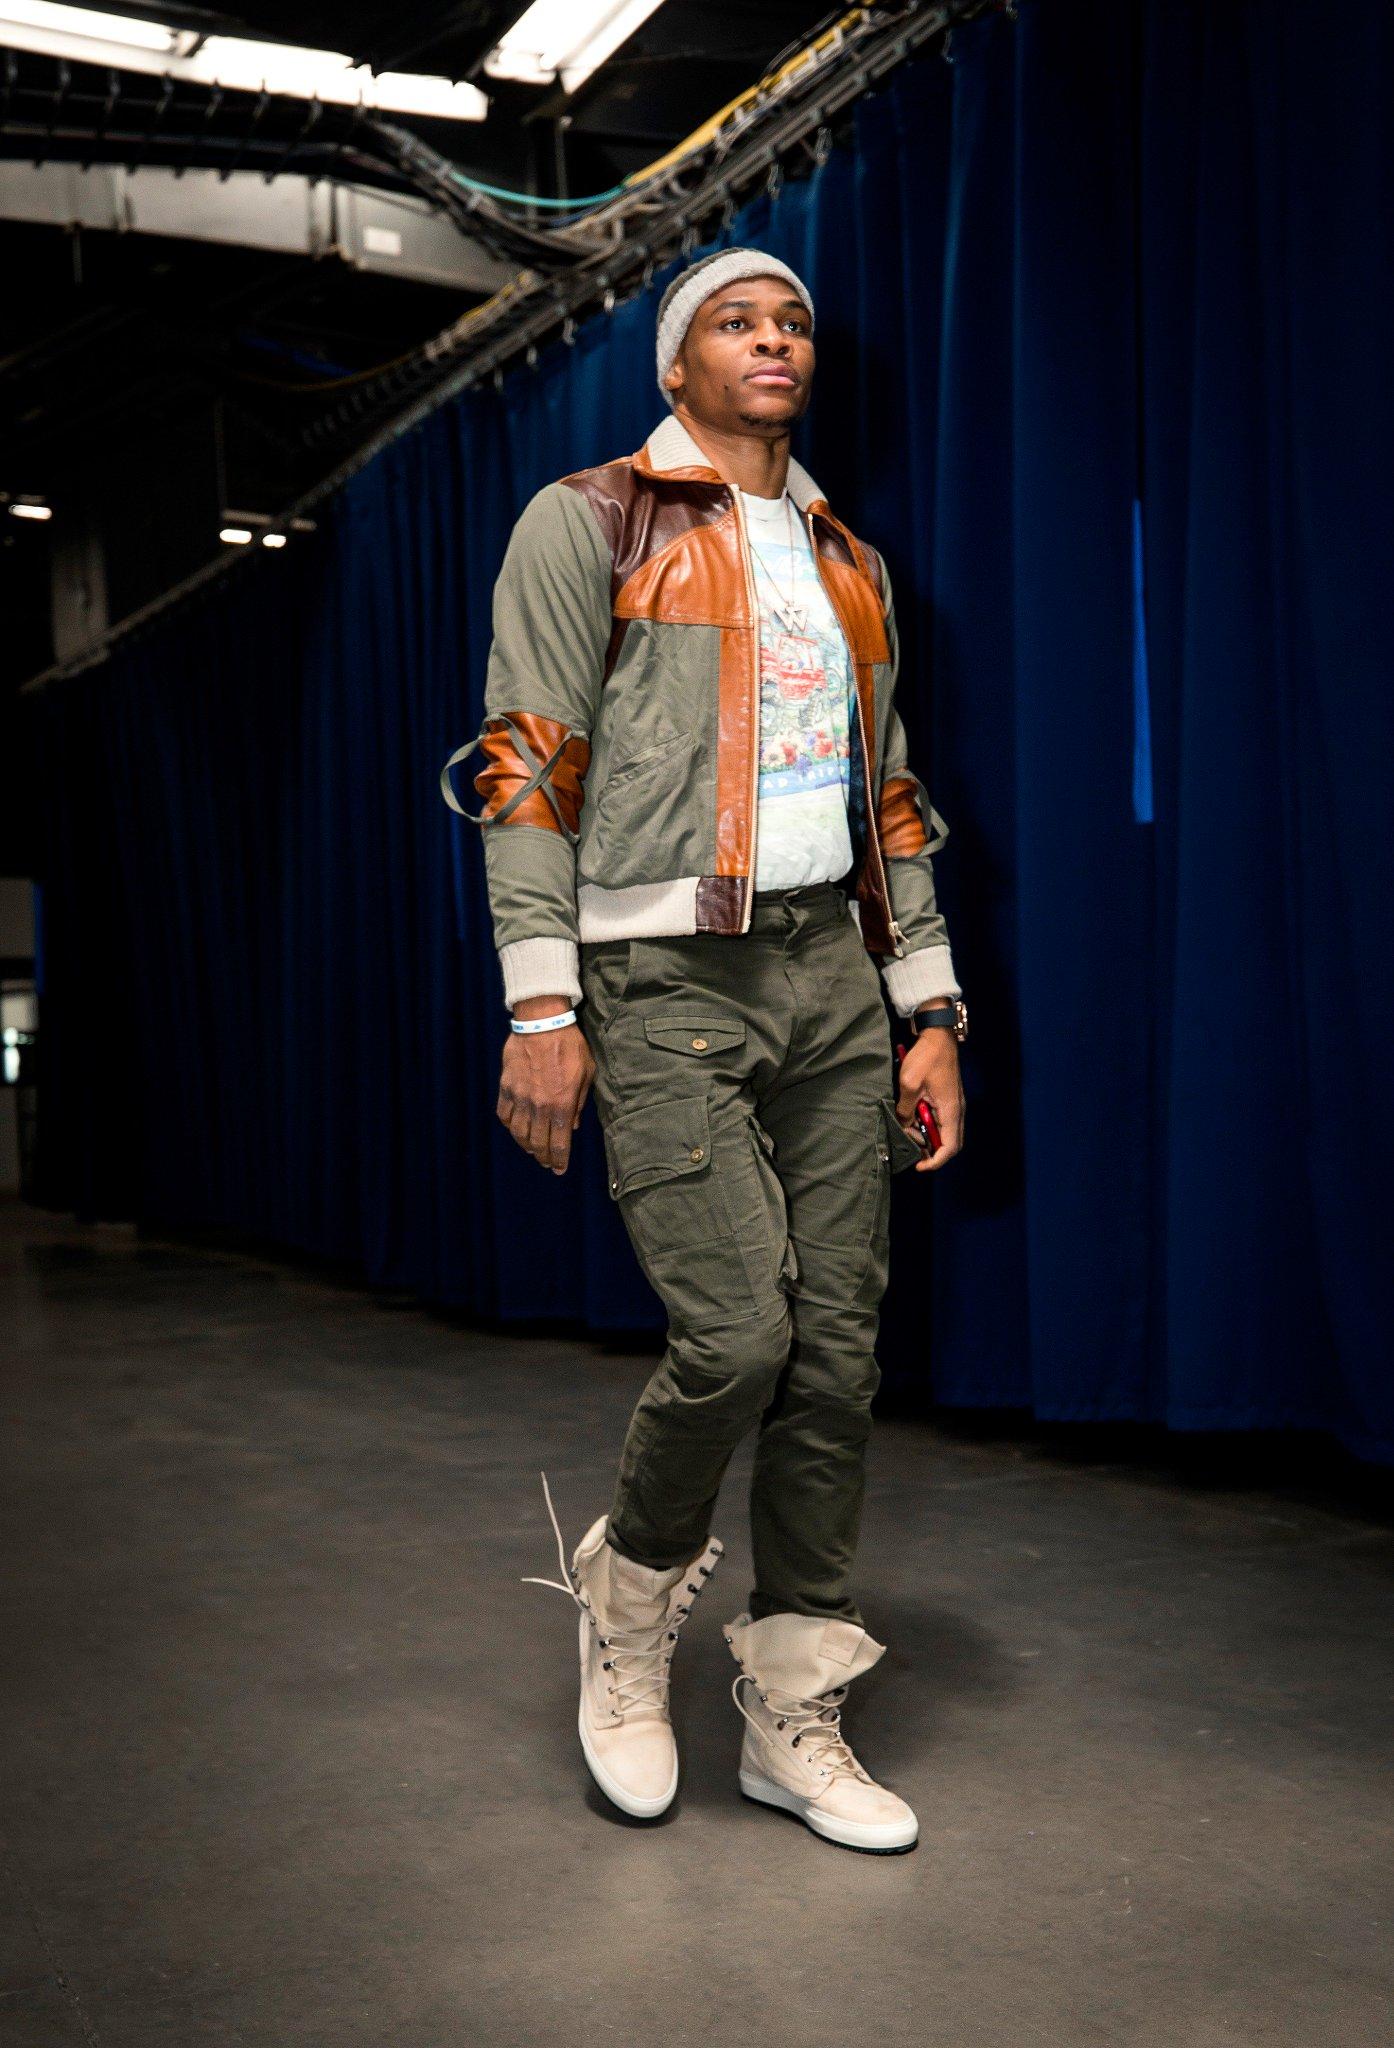 Russell Westbrook arrives for his 2018-19 season debut. #ThunderUp   Kings/Thunder: 7pm/et on NBA League Pass https://t.co/NdjjOKzJXh